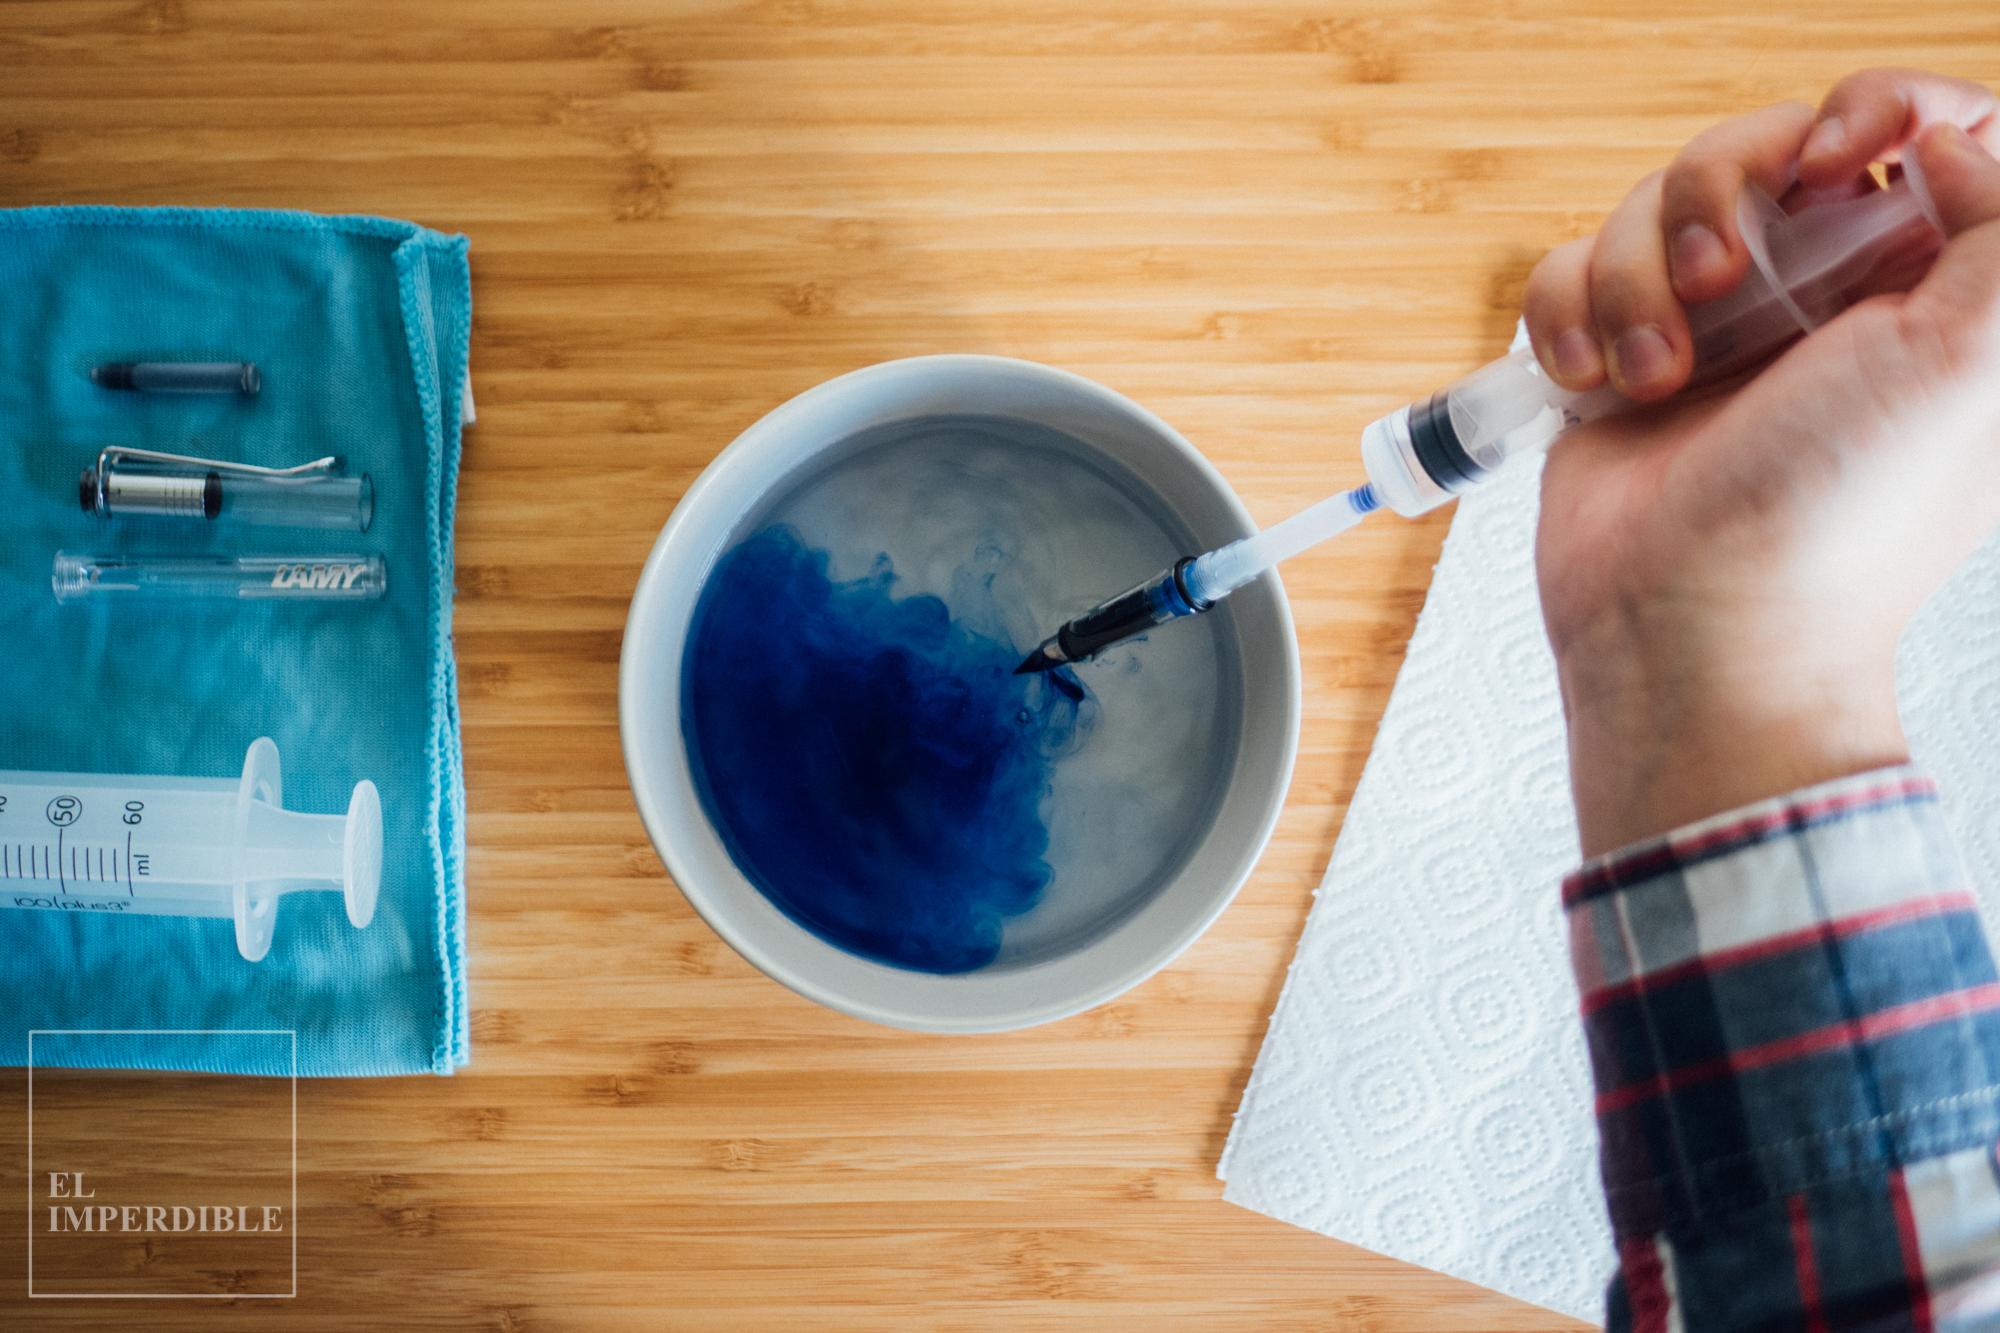 Cómo limpiar una pluma estilográfica desatascar la tinta seca